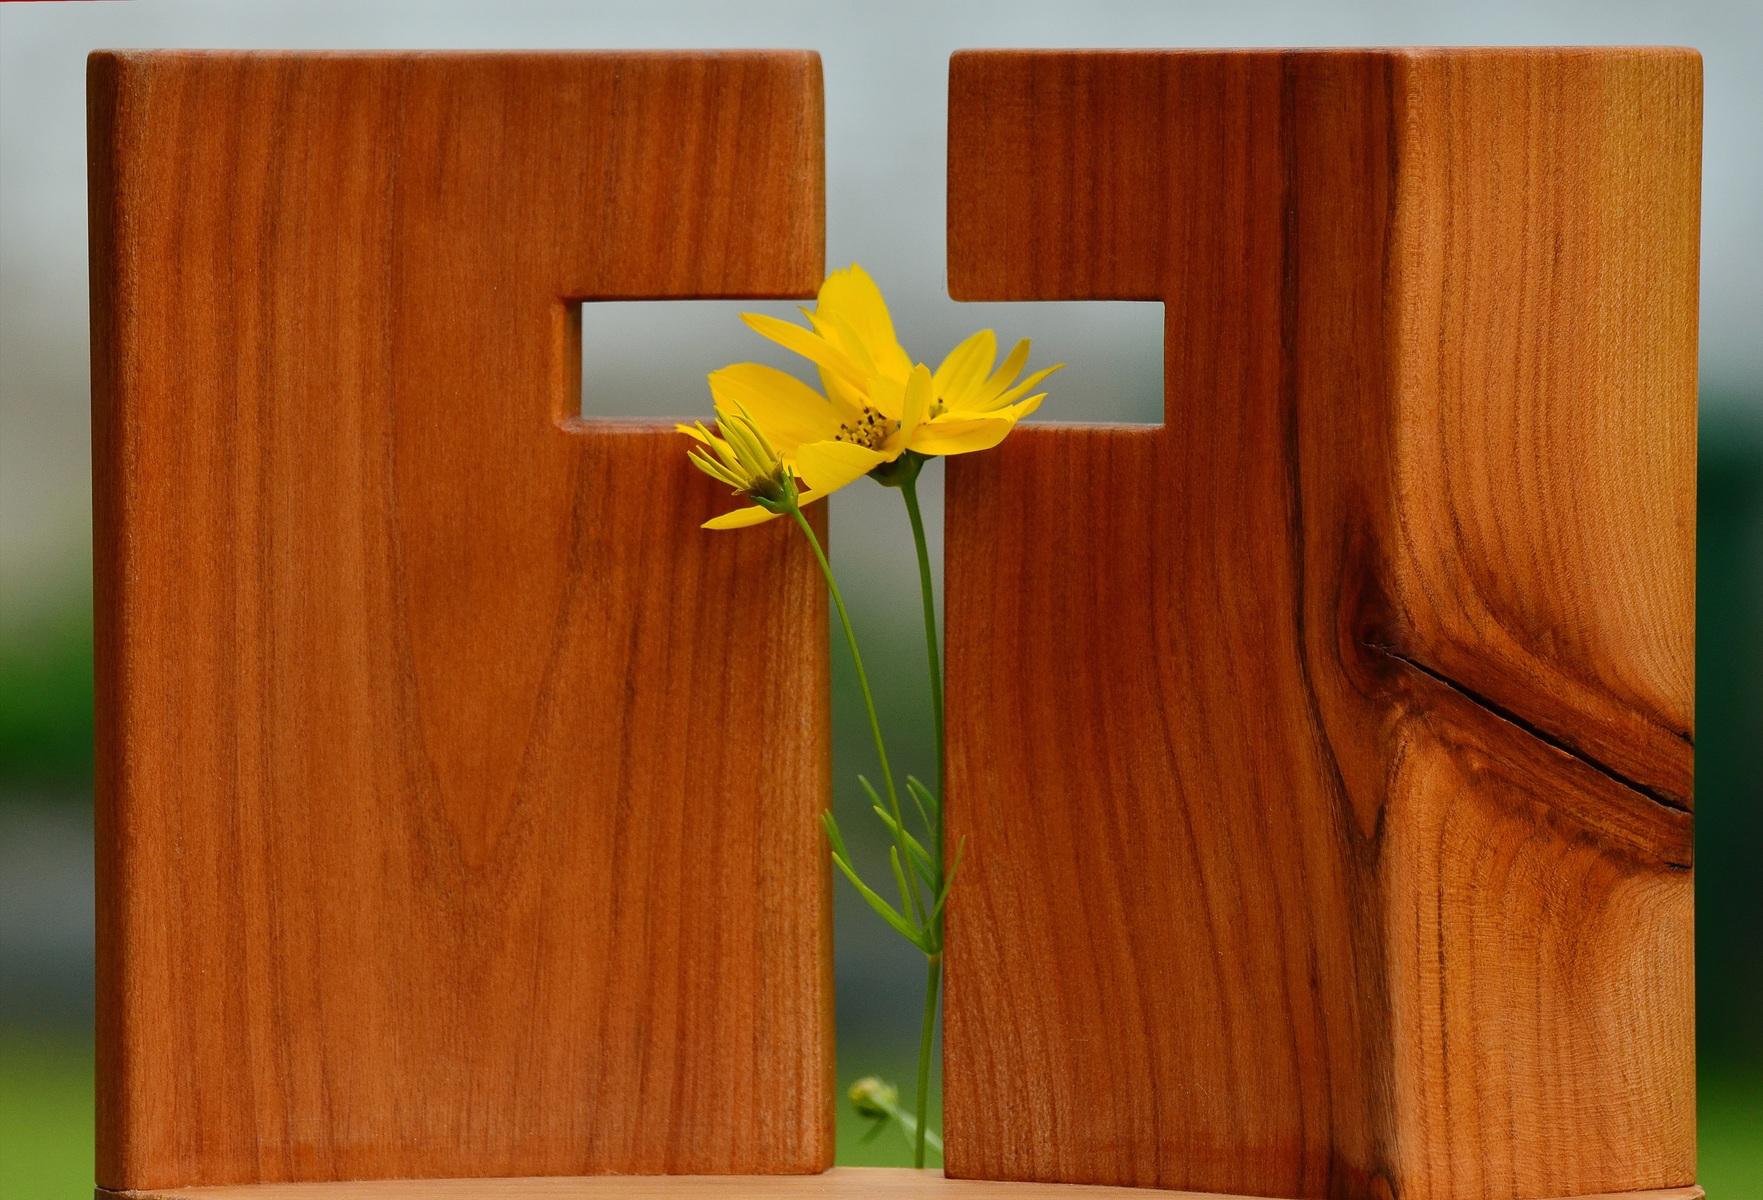 wood-flower-live-green-symbol-religion-578137-pxhere.com